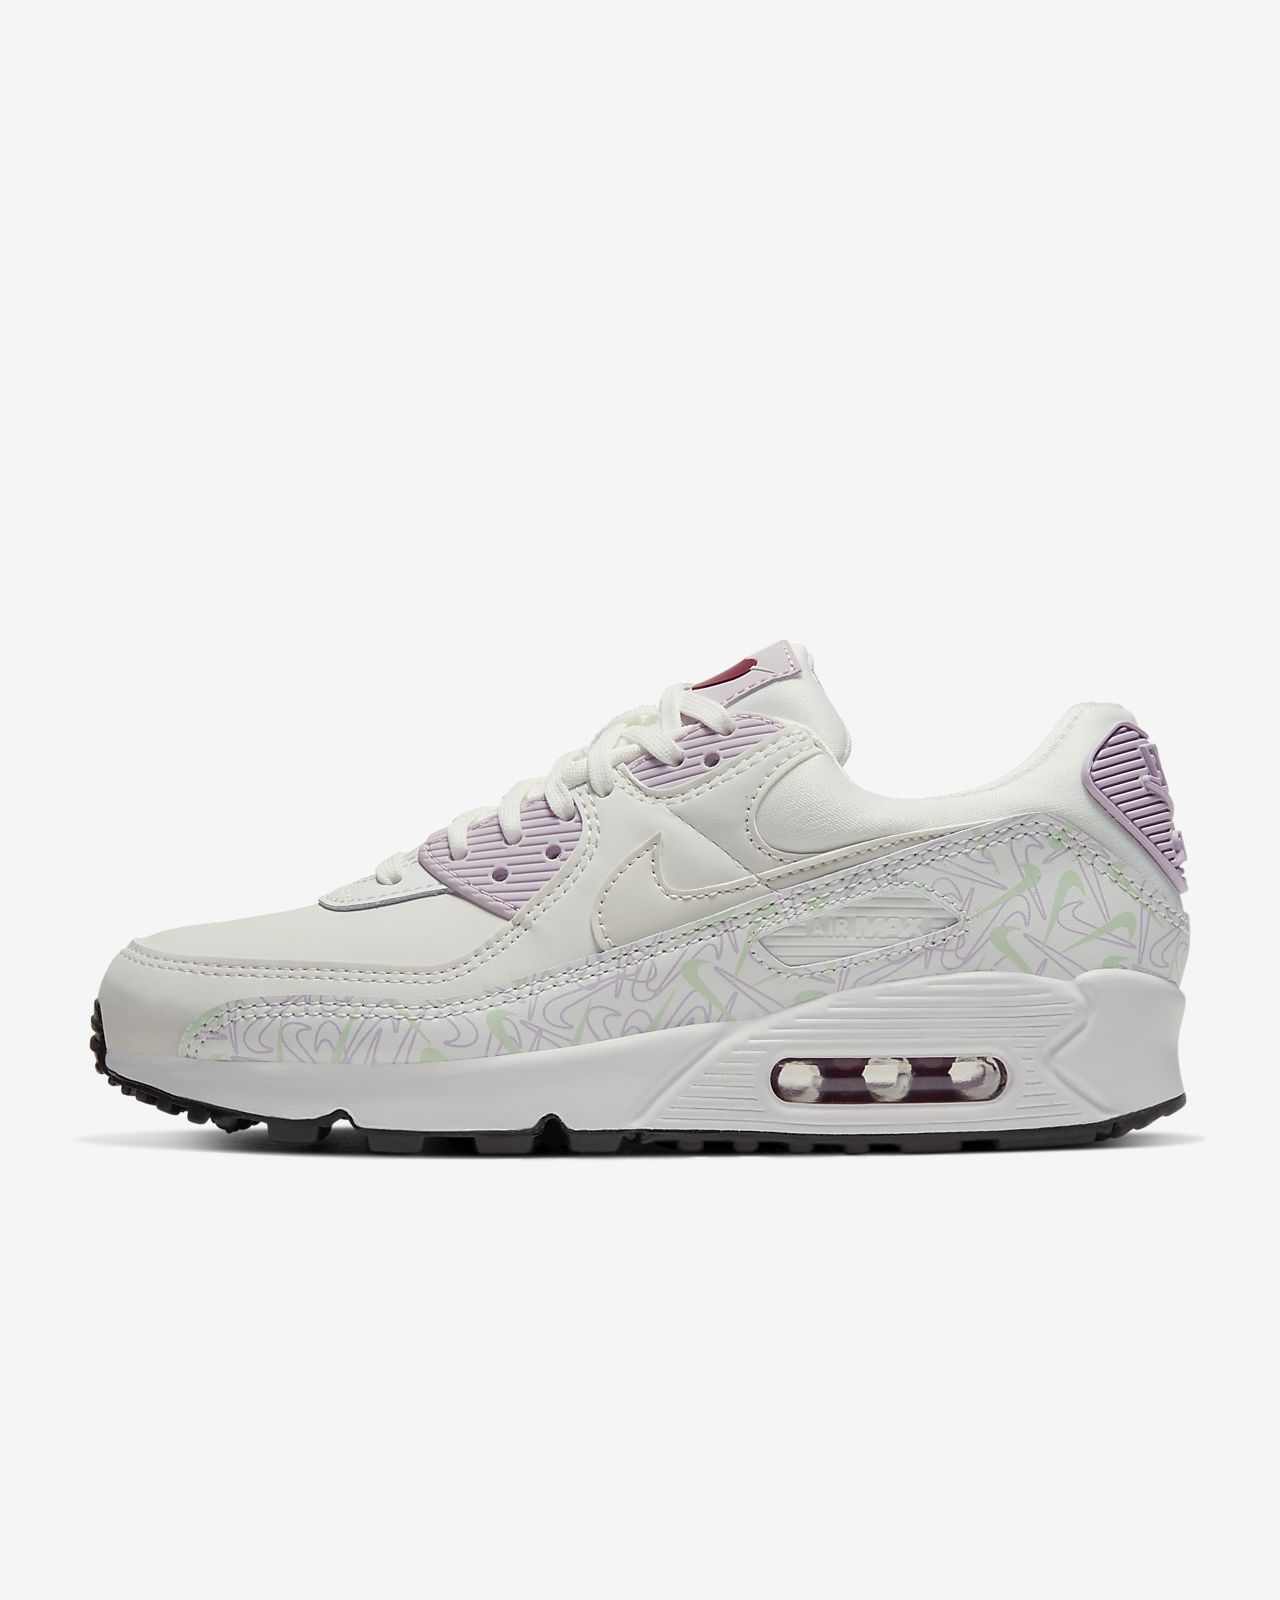 nike air max 90 pink grey white